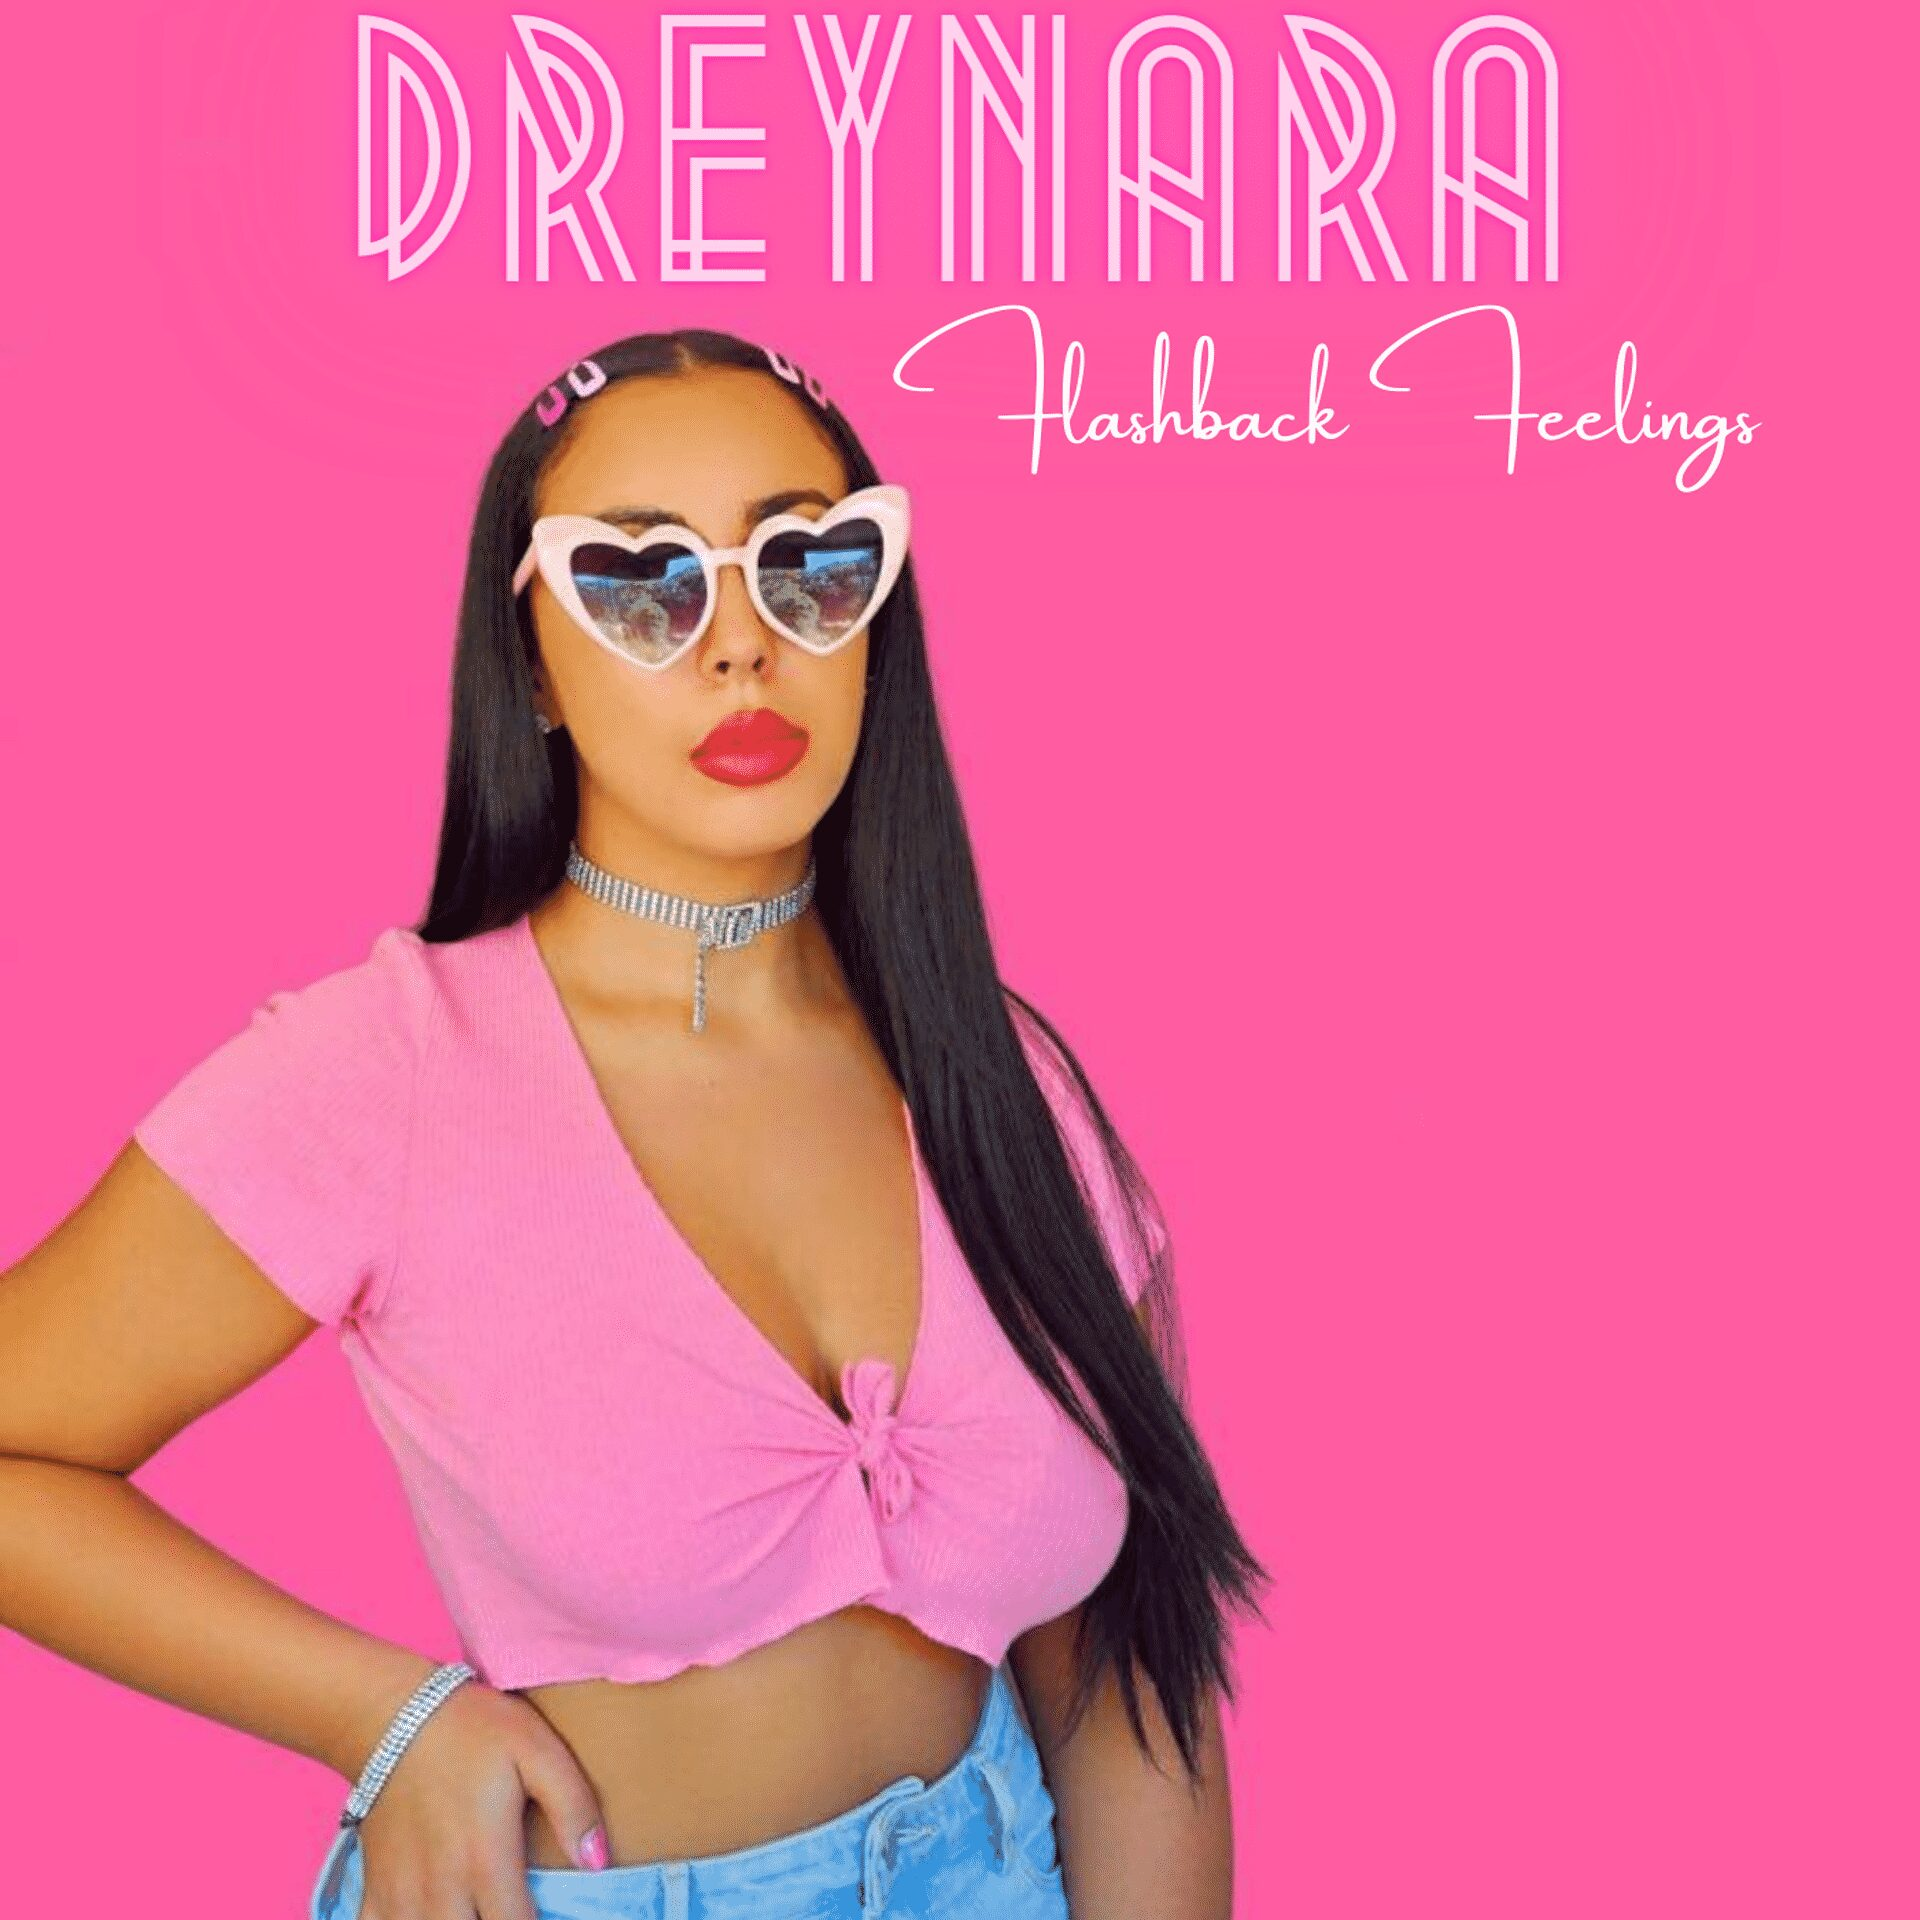 Dreynara Pop Pianist Singer Songwriter